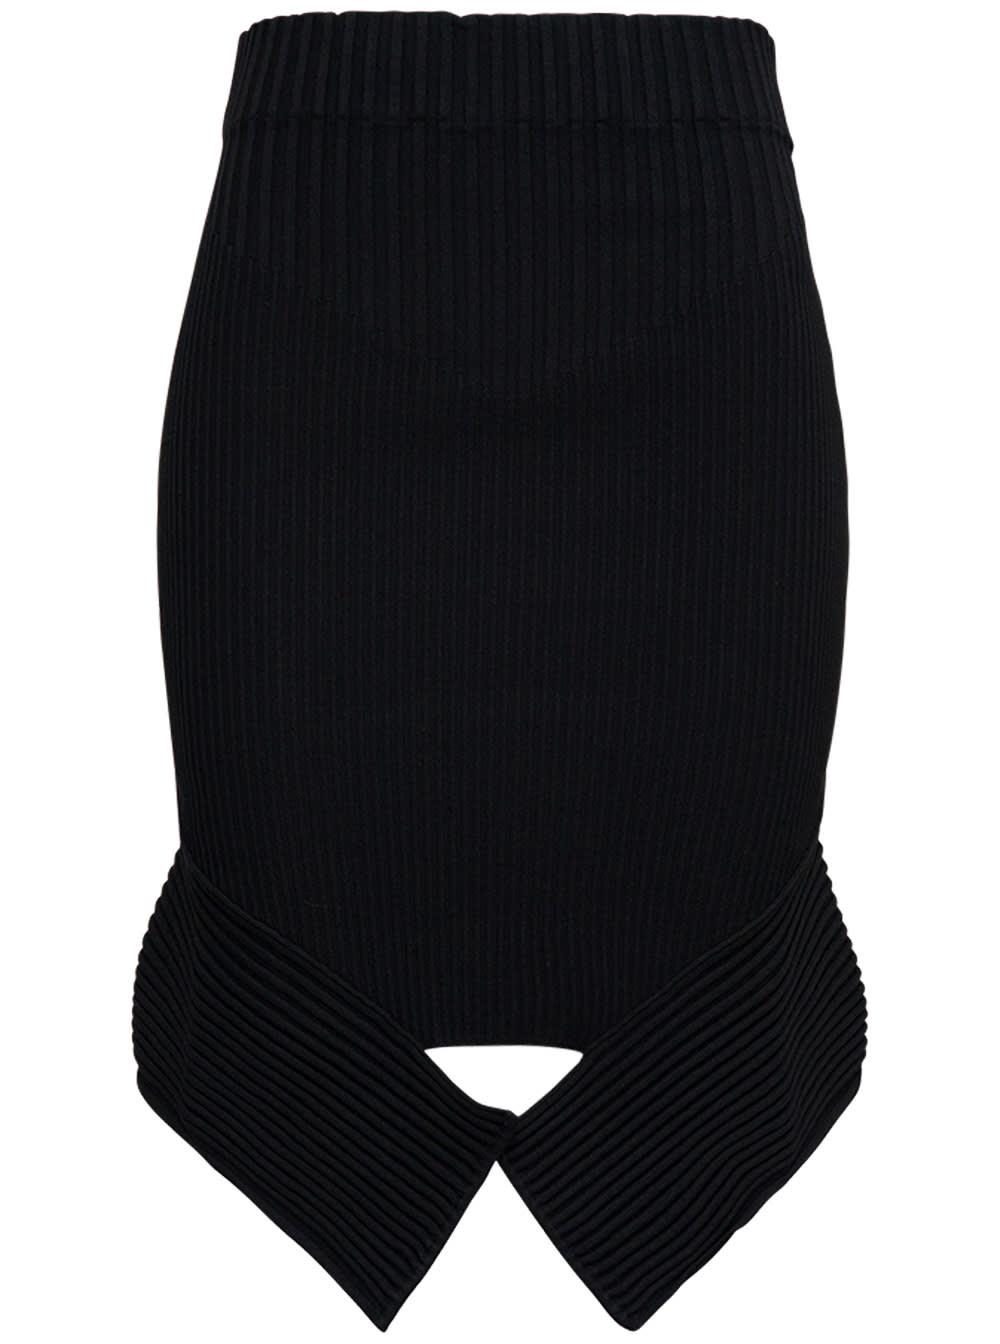 Black High Waist Skirt With Cut Out Detail